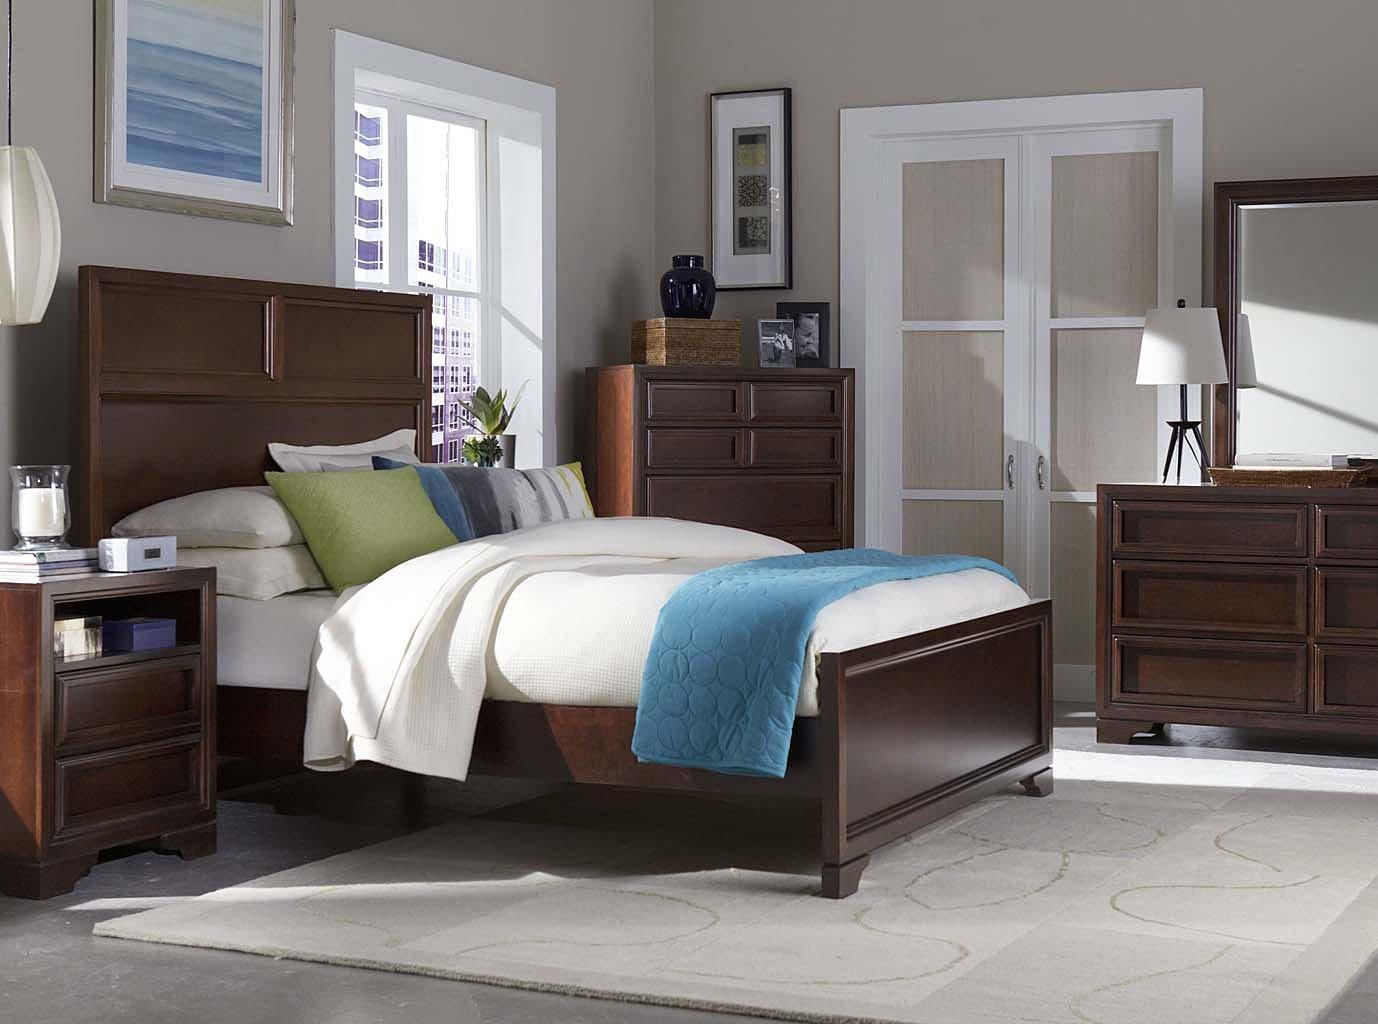 Benchmark Panel Bedroom Set Legacy Classic Kids ...